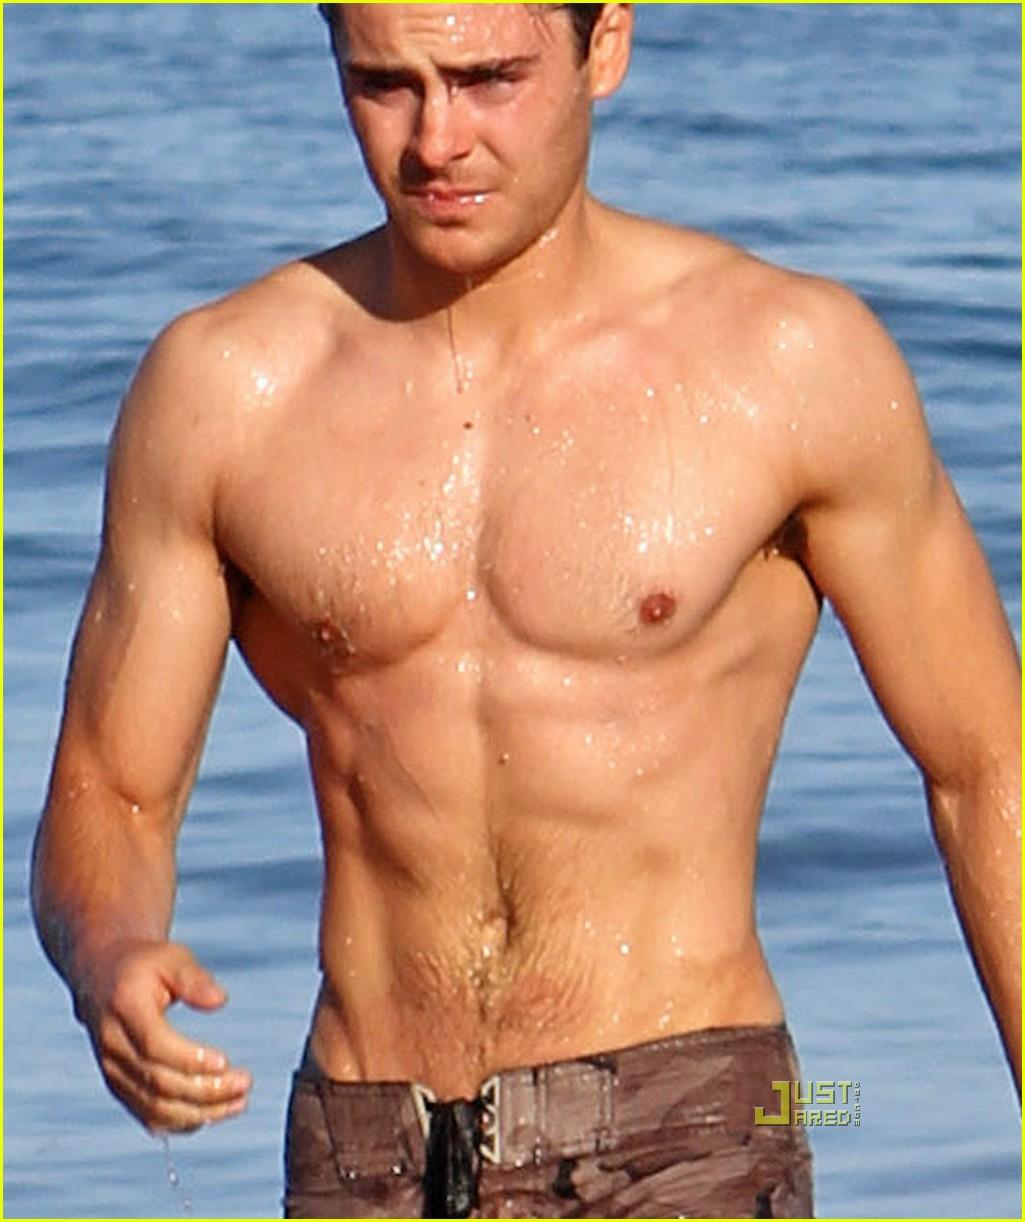 http://1.bp.blogspot.com/_ROXZFfuHbrs/TFCzXdUBerI/AAAAAAAAMZ8/vw-gzRSf_l4/s1600/zac+efron+topless+6.jpg